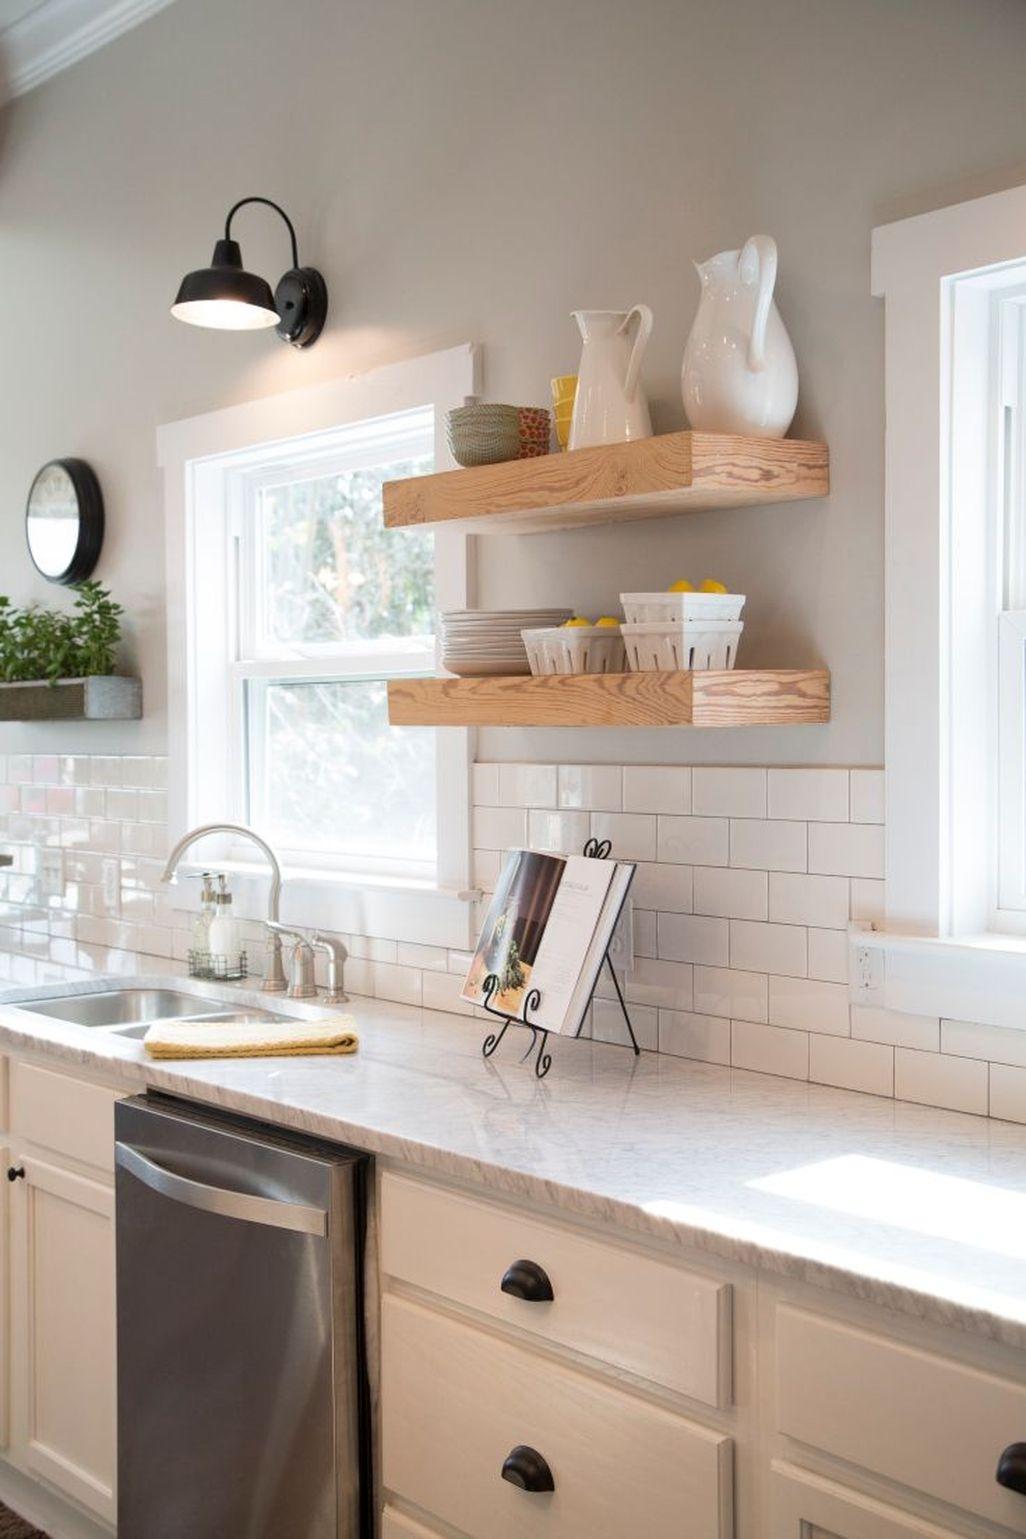 Awesome White Kitchen Backsplash Design Ideas 16